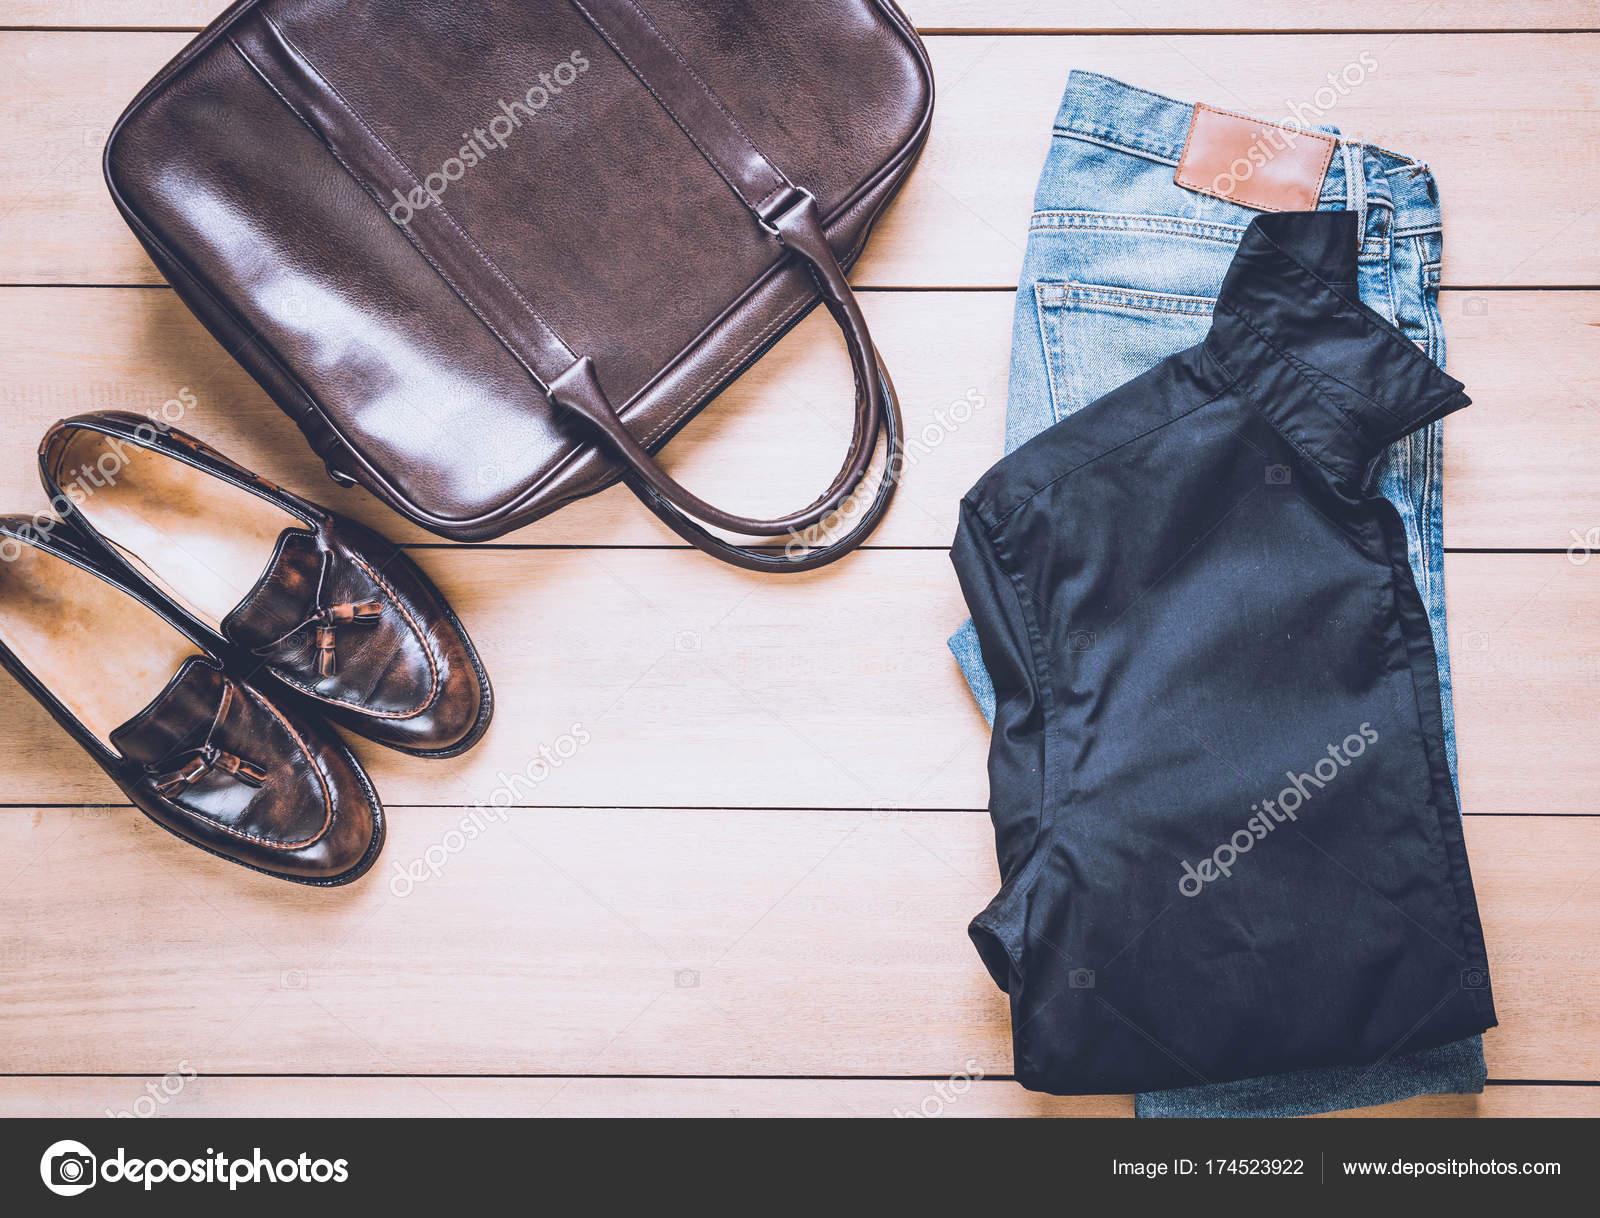 845ed00f404b Όμορφη μόδας Ανδρικά casual ρούχα ένδυσης - vintage αποτέλεσμα φίλτρο —  Εικόνα από ...